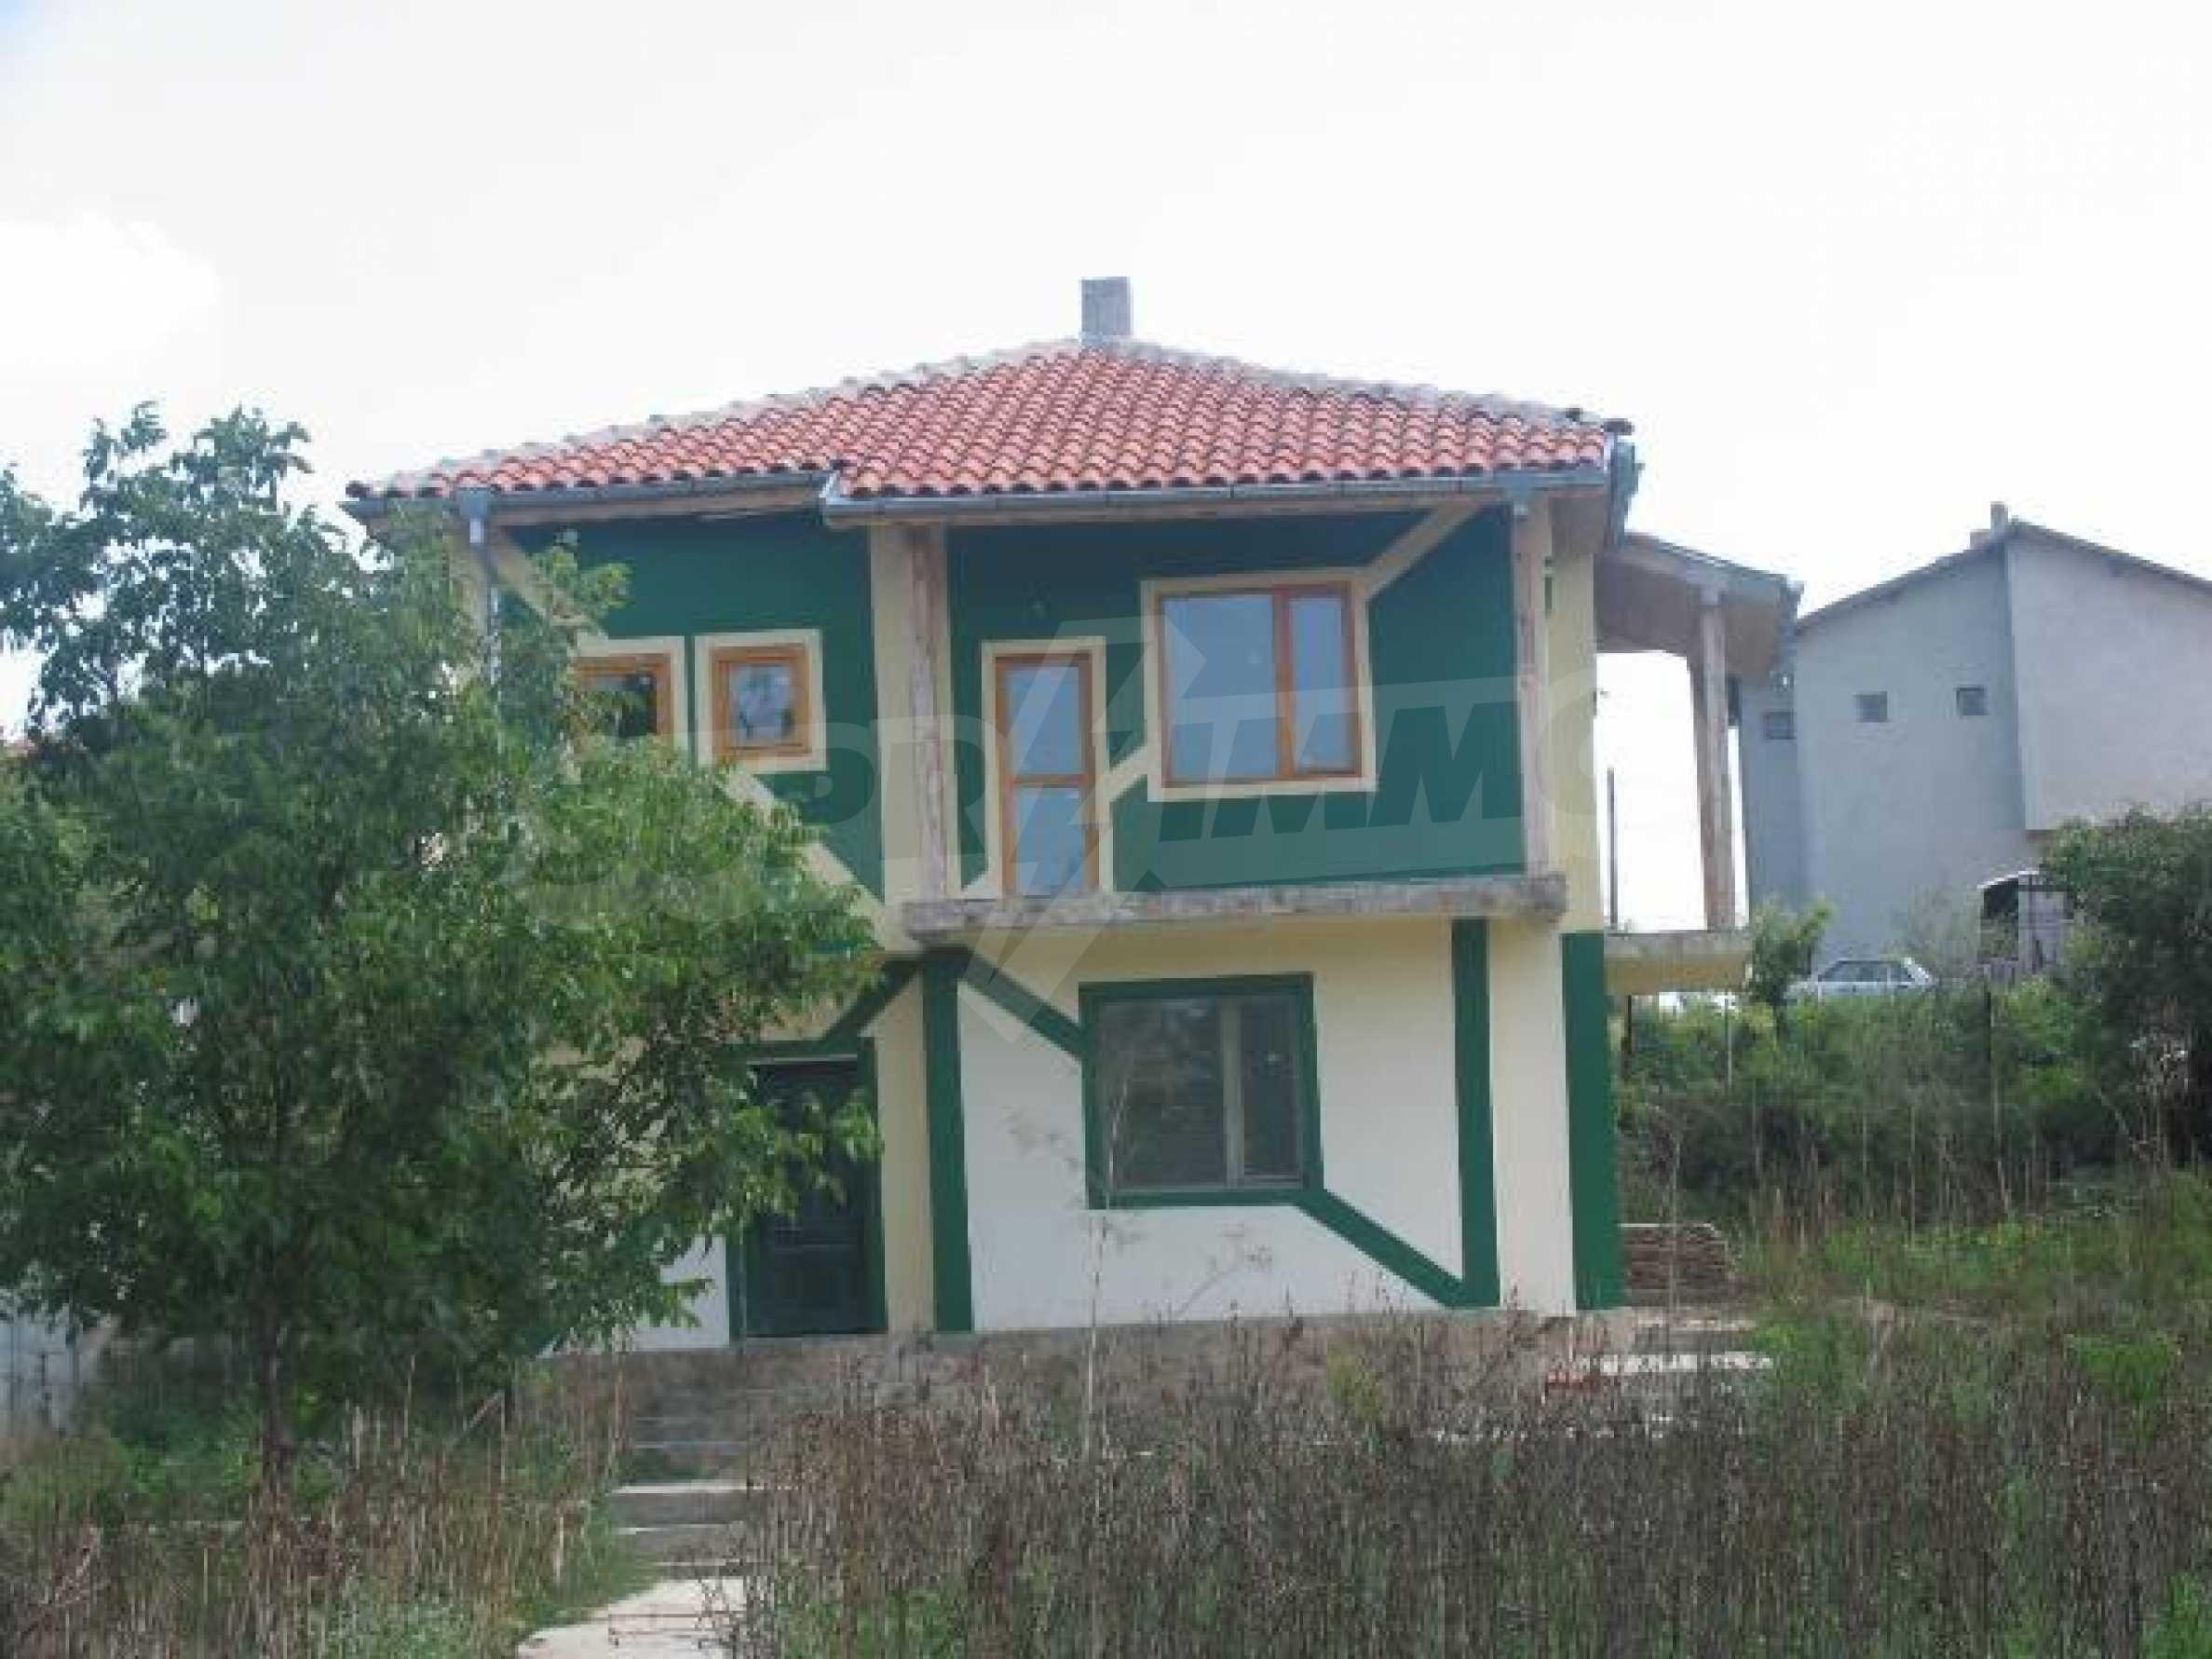 Two family houses in Durankulak village 1